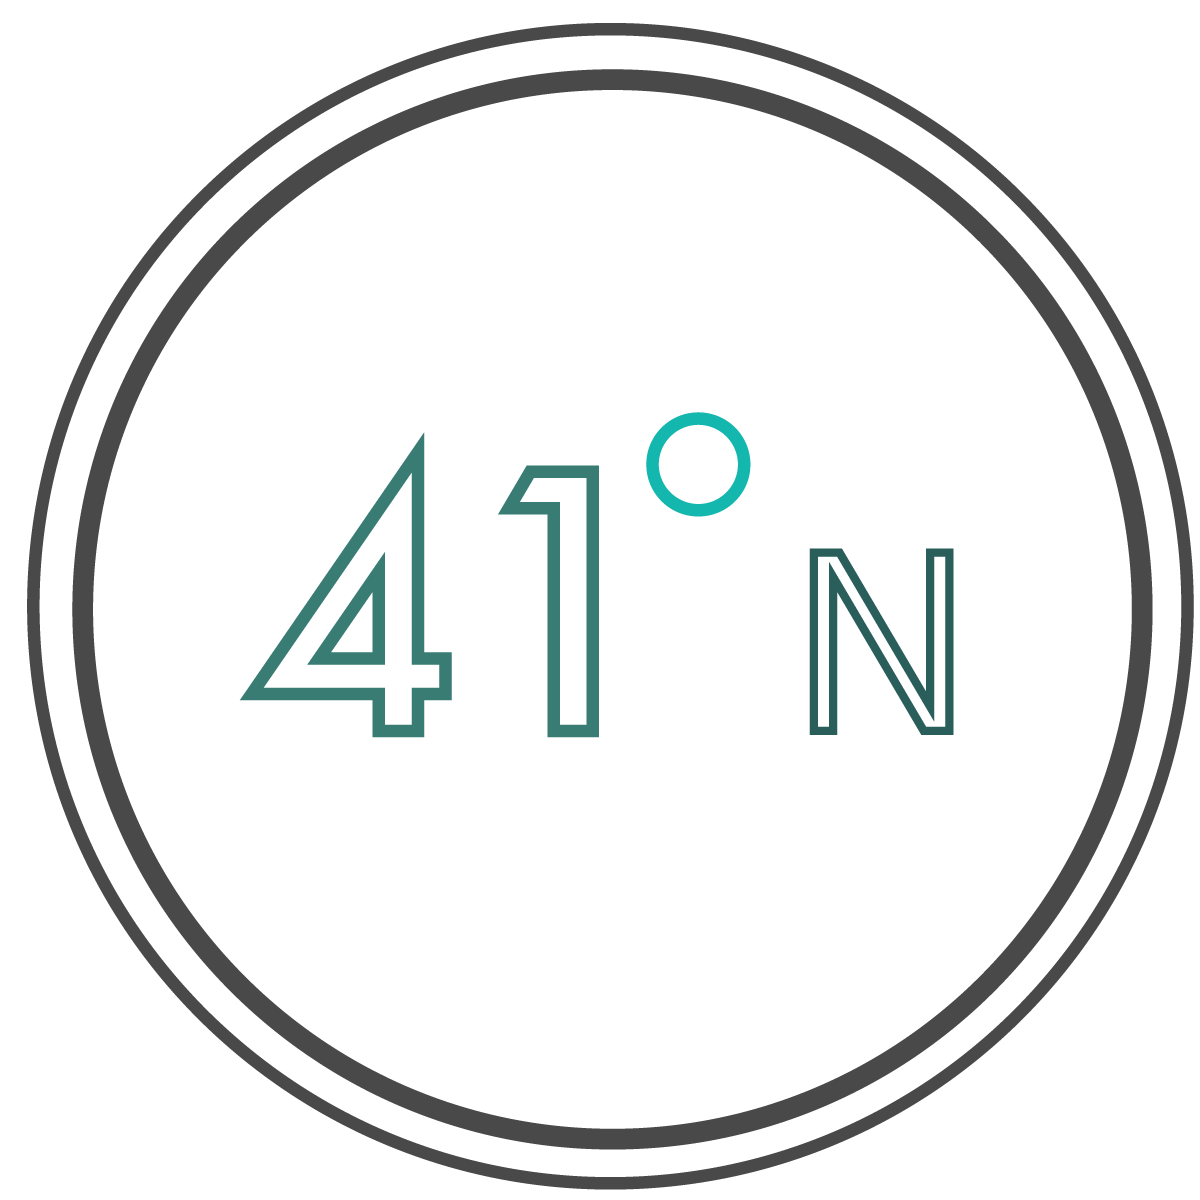 41North_LogoBoat-01-01.png